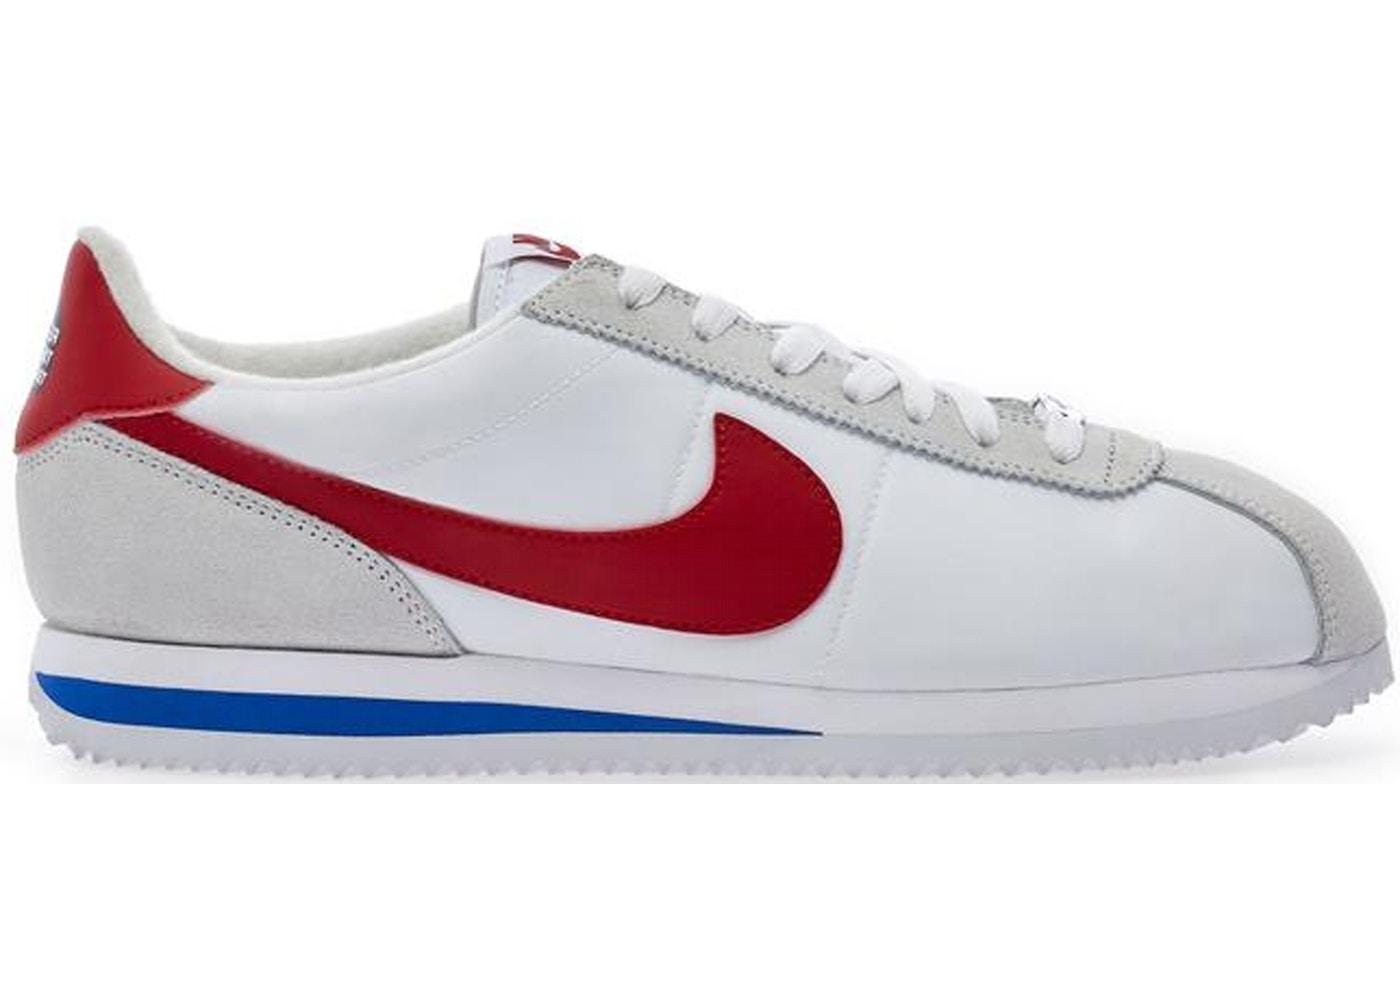 de77e803deda6 Sell. or Ask. Size: 10.5. View All Bids. Nike Cortez Nylon DSM Forrest Gump